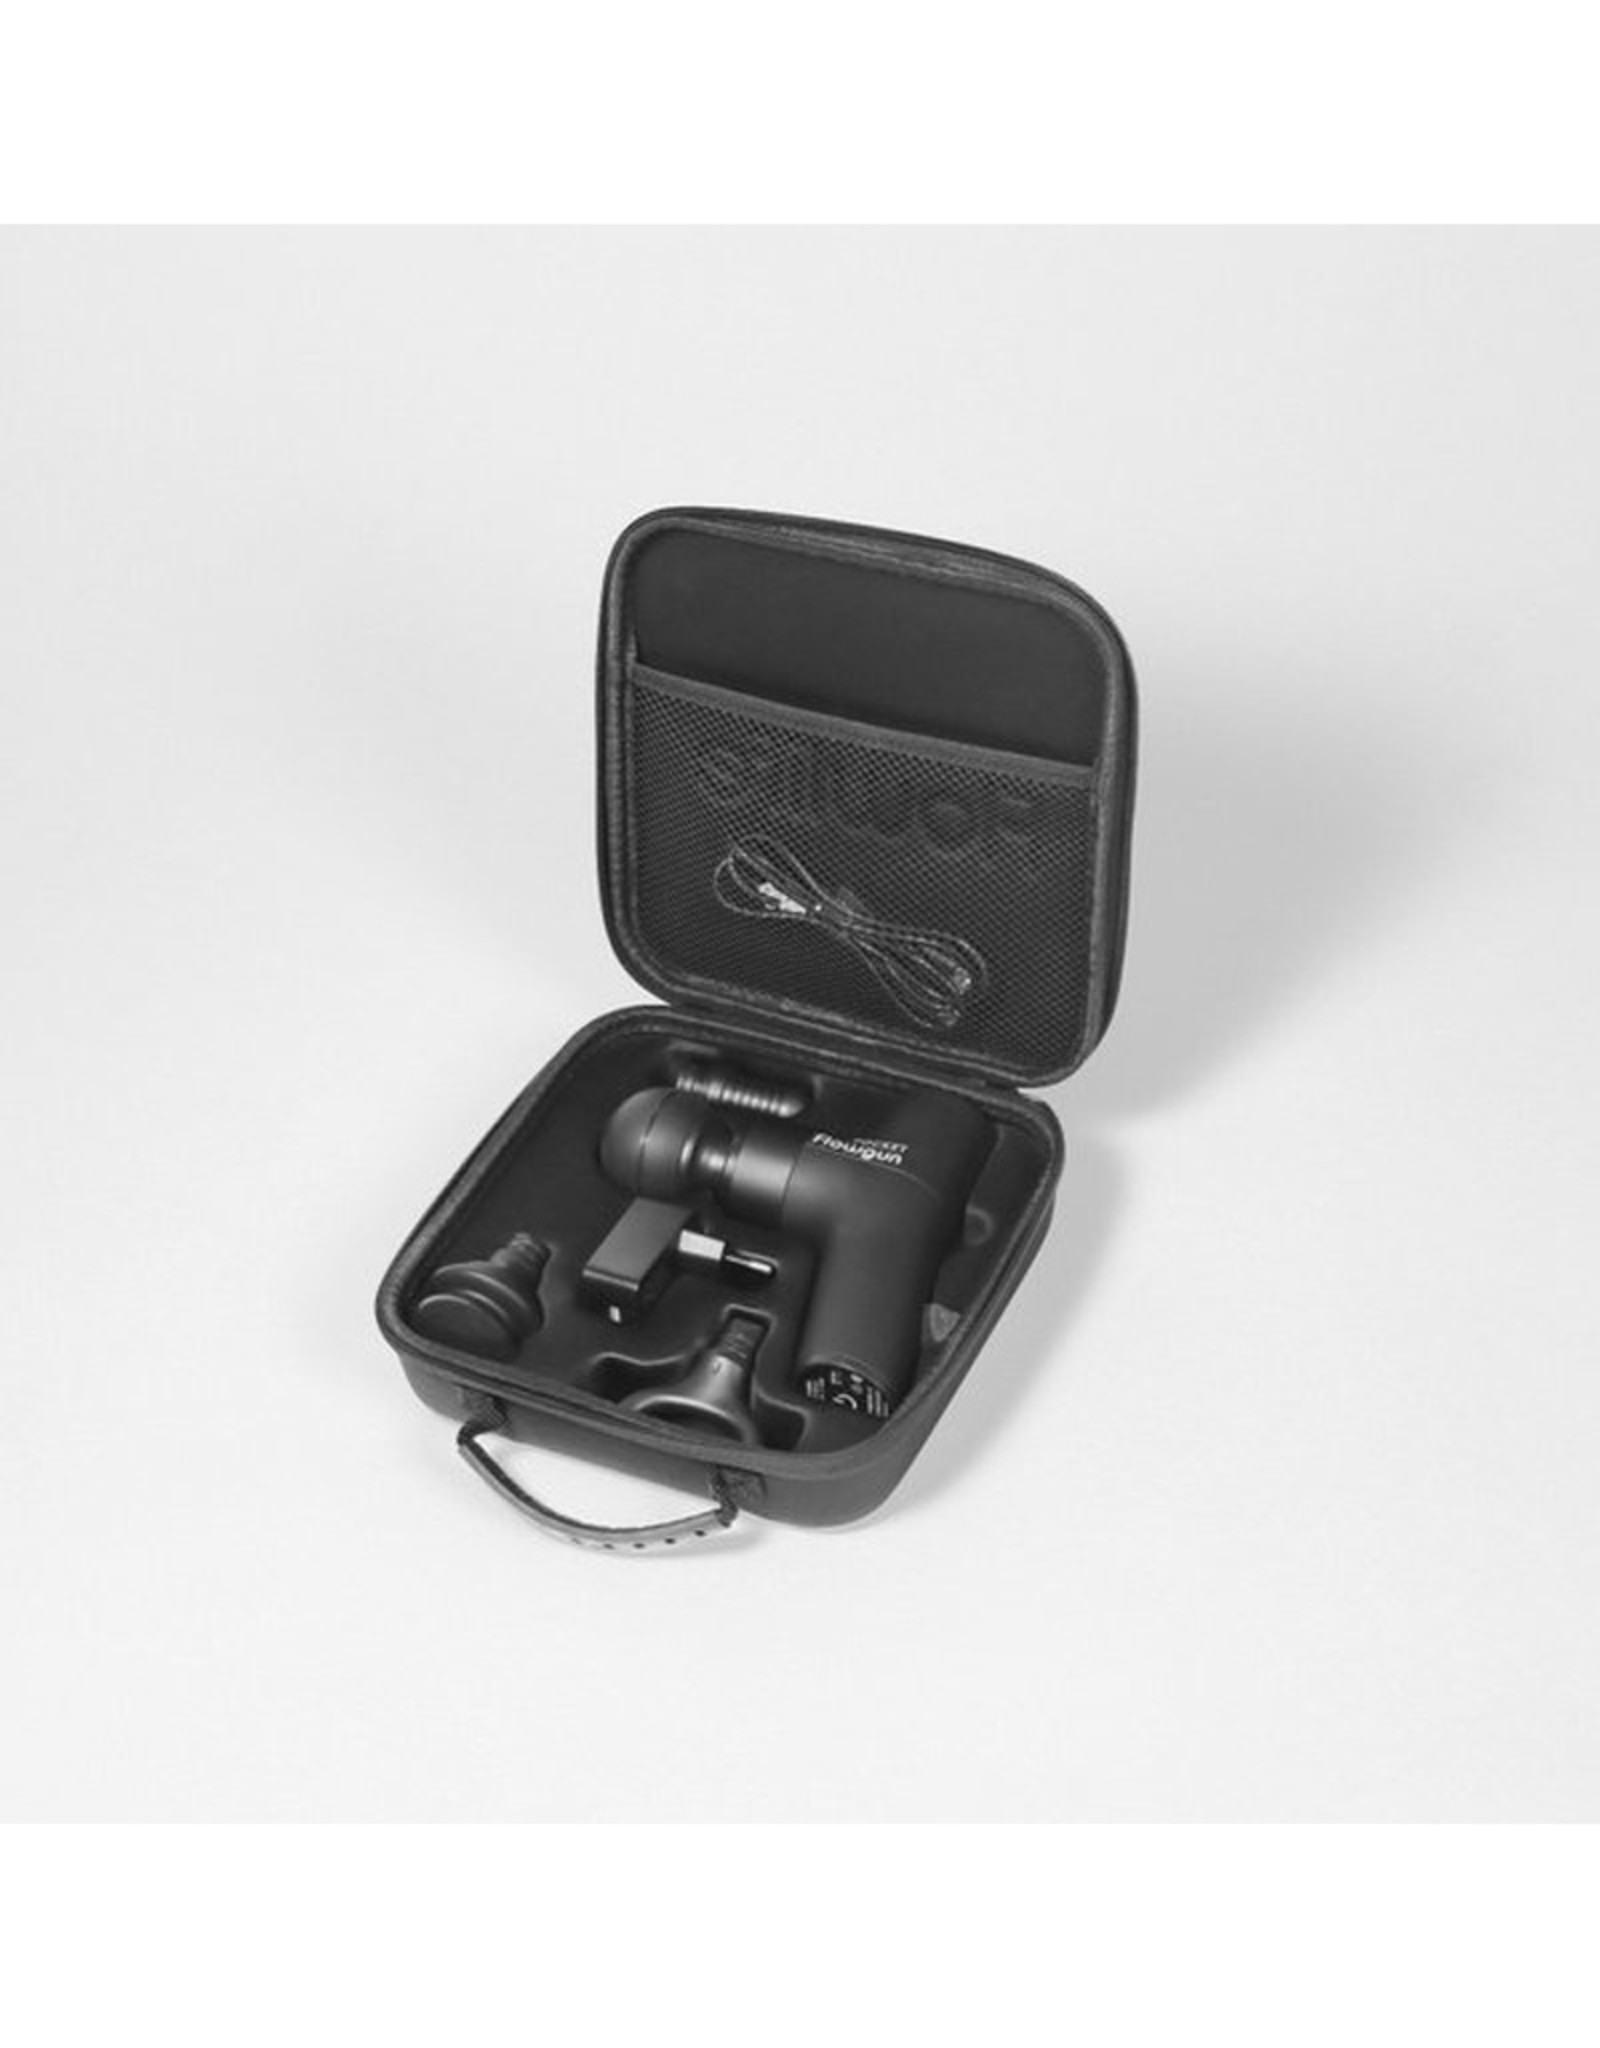 Flowlife Flowgun Pocket - Black - One size